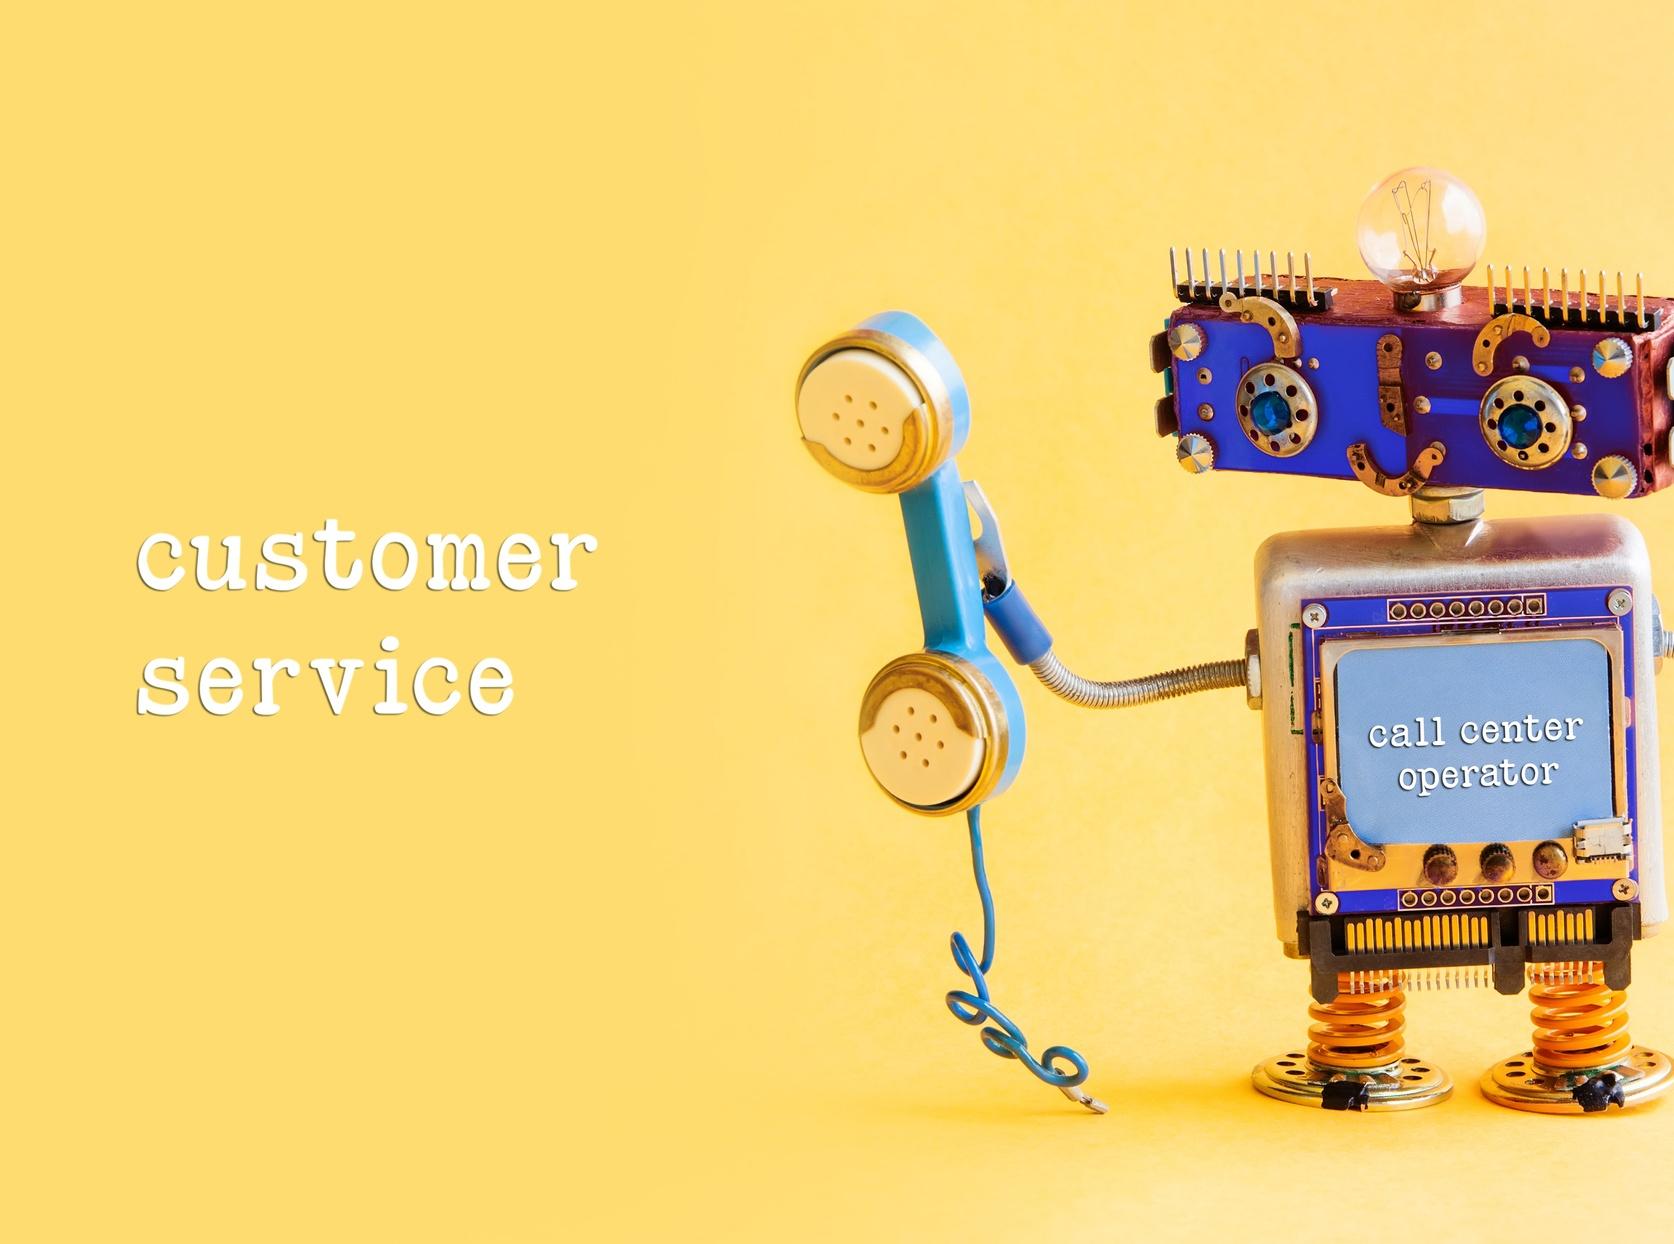 customer servicebot.jpg